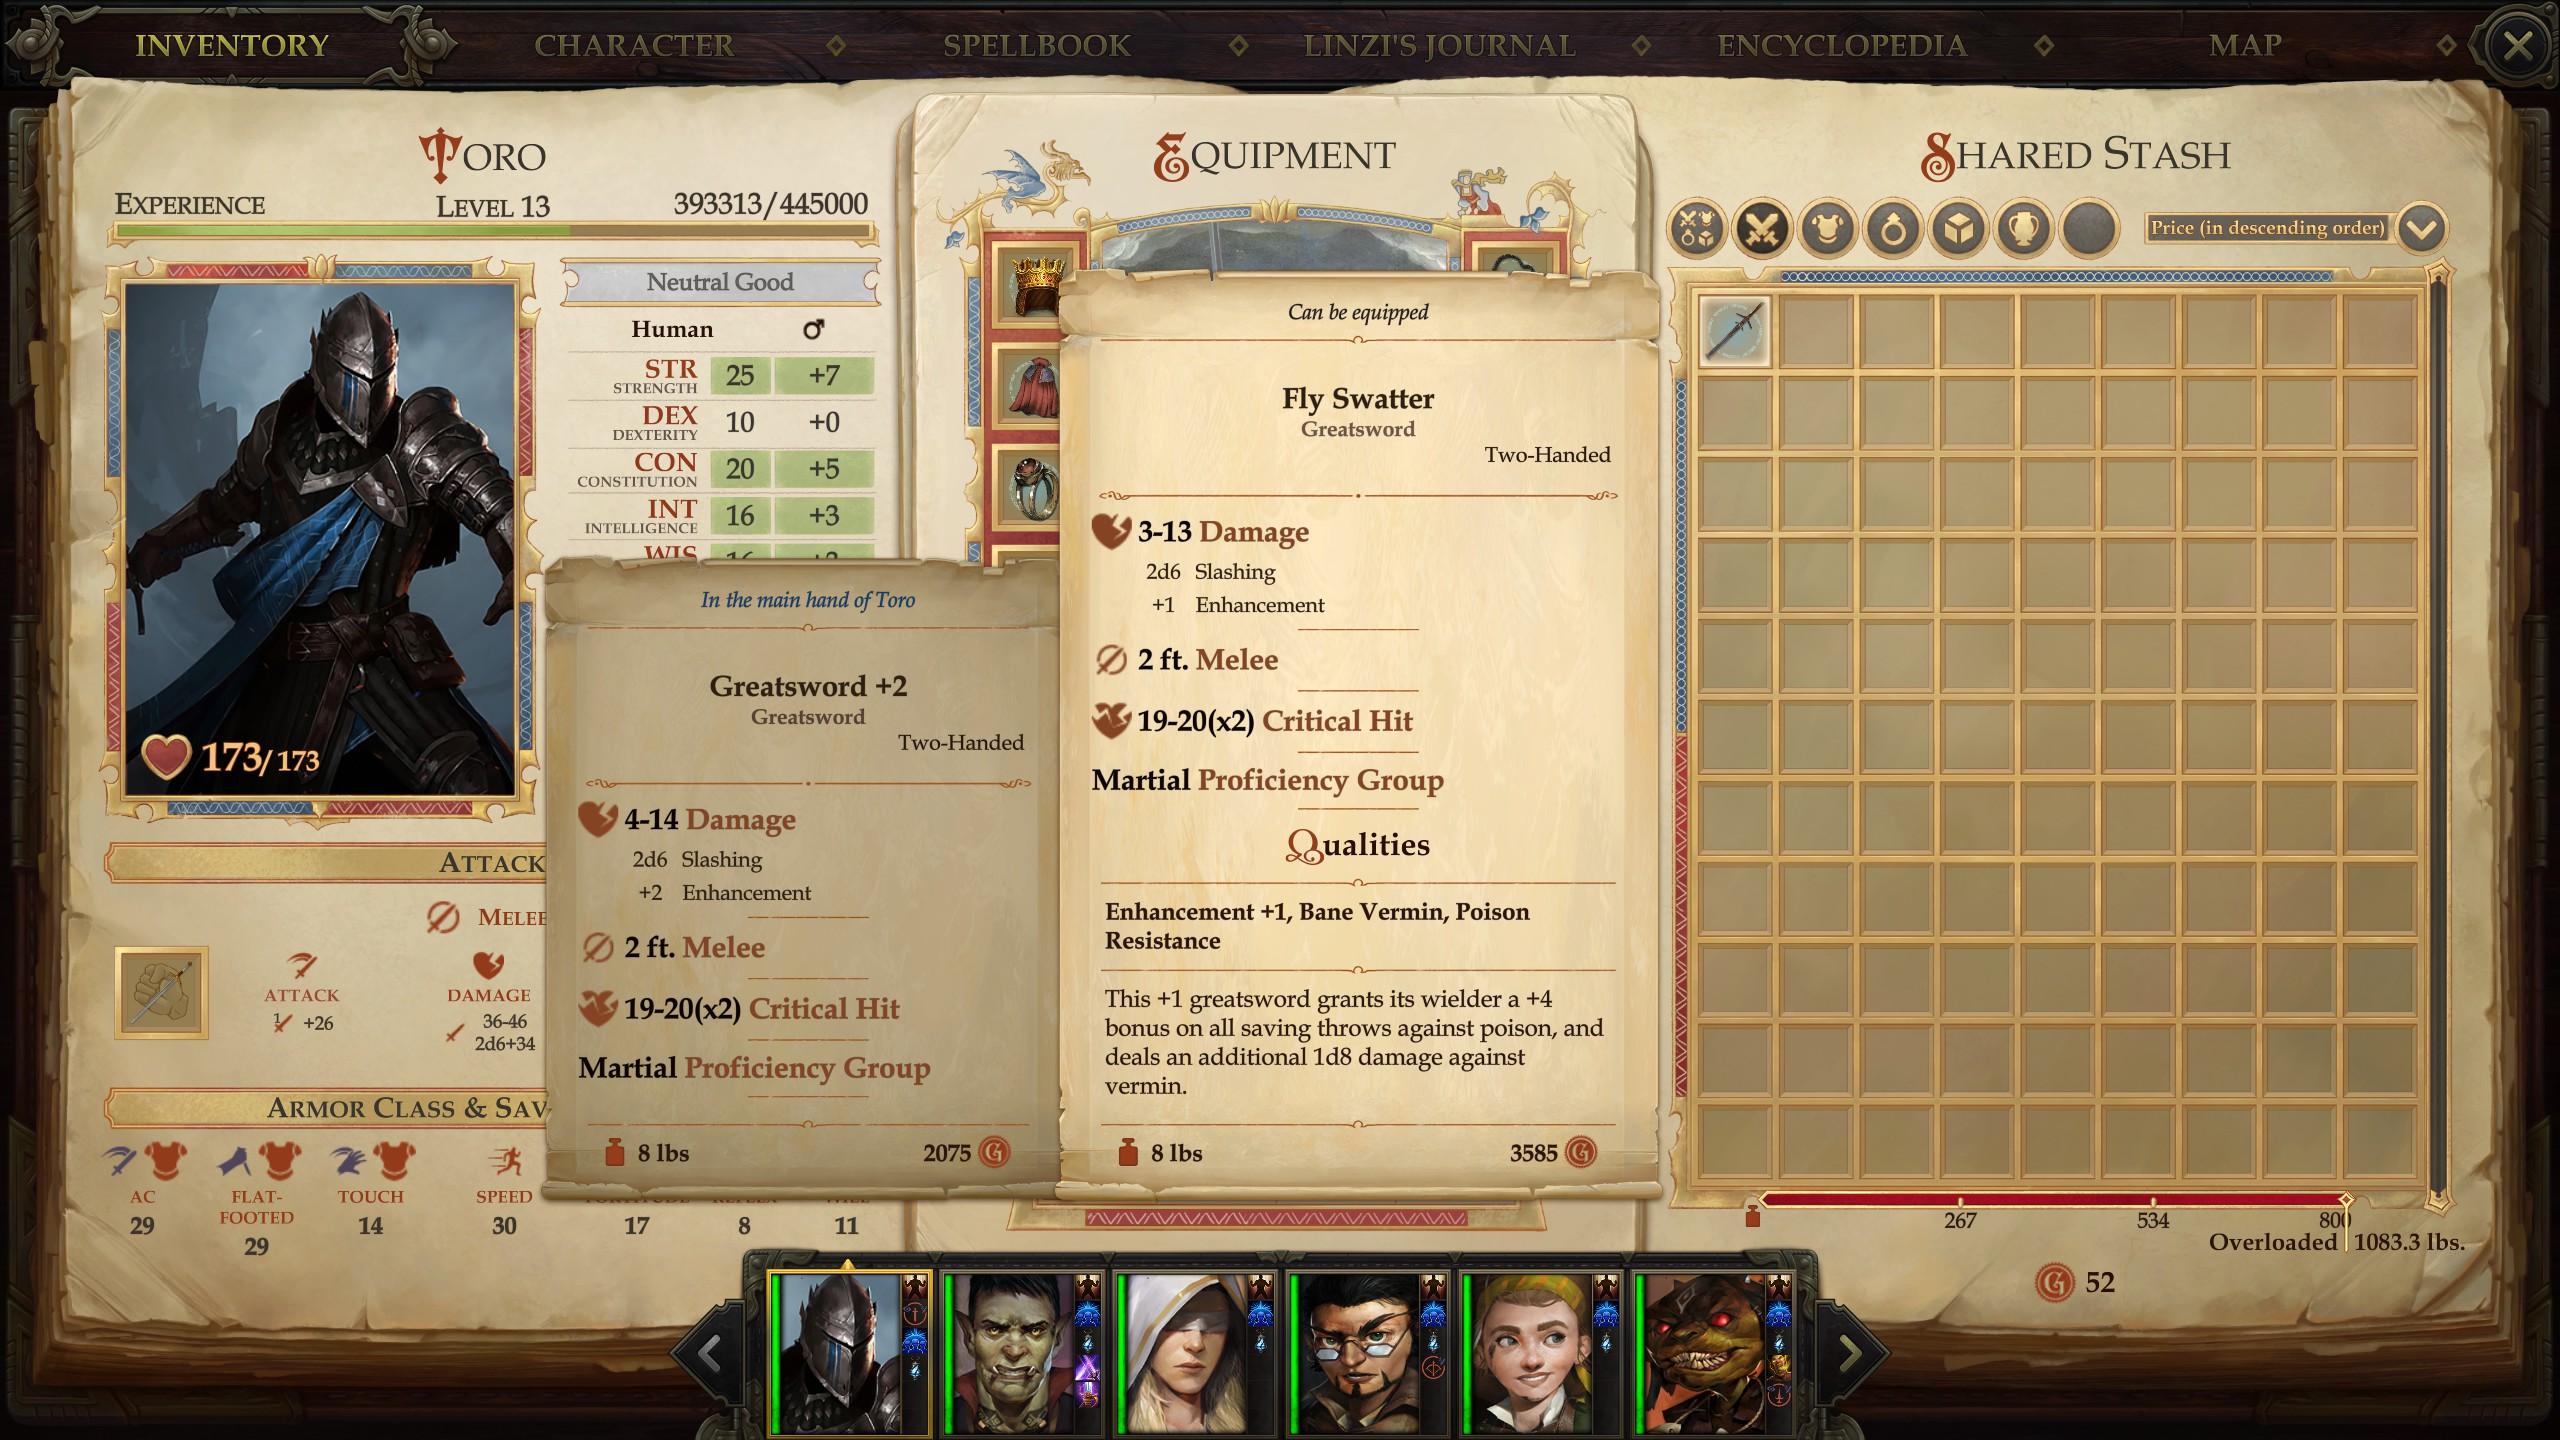 KickStarter - Pathfinder: Kingmaker Pre-DLC Thread [GO TO NEW THREAD